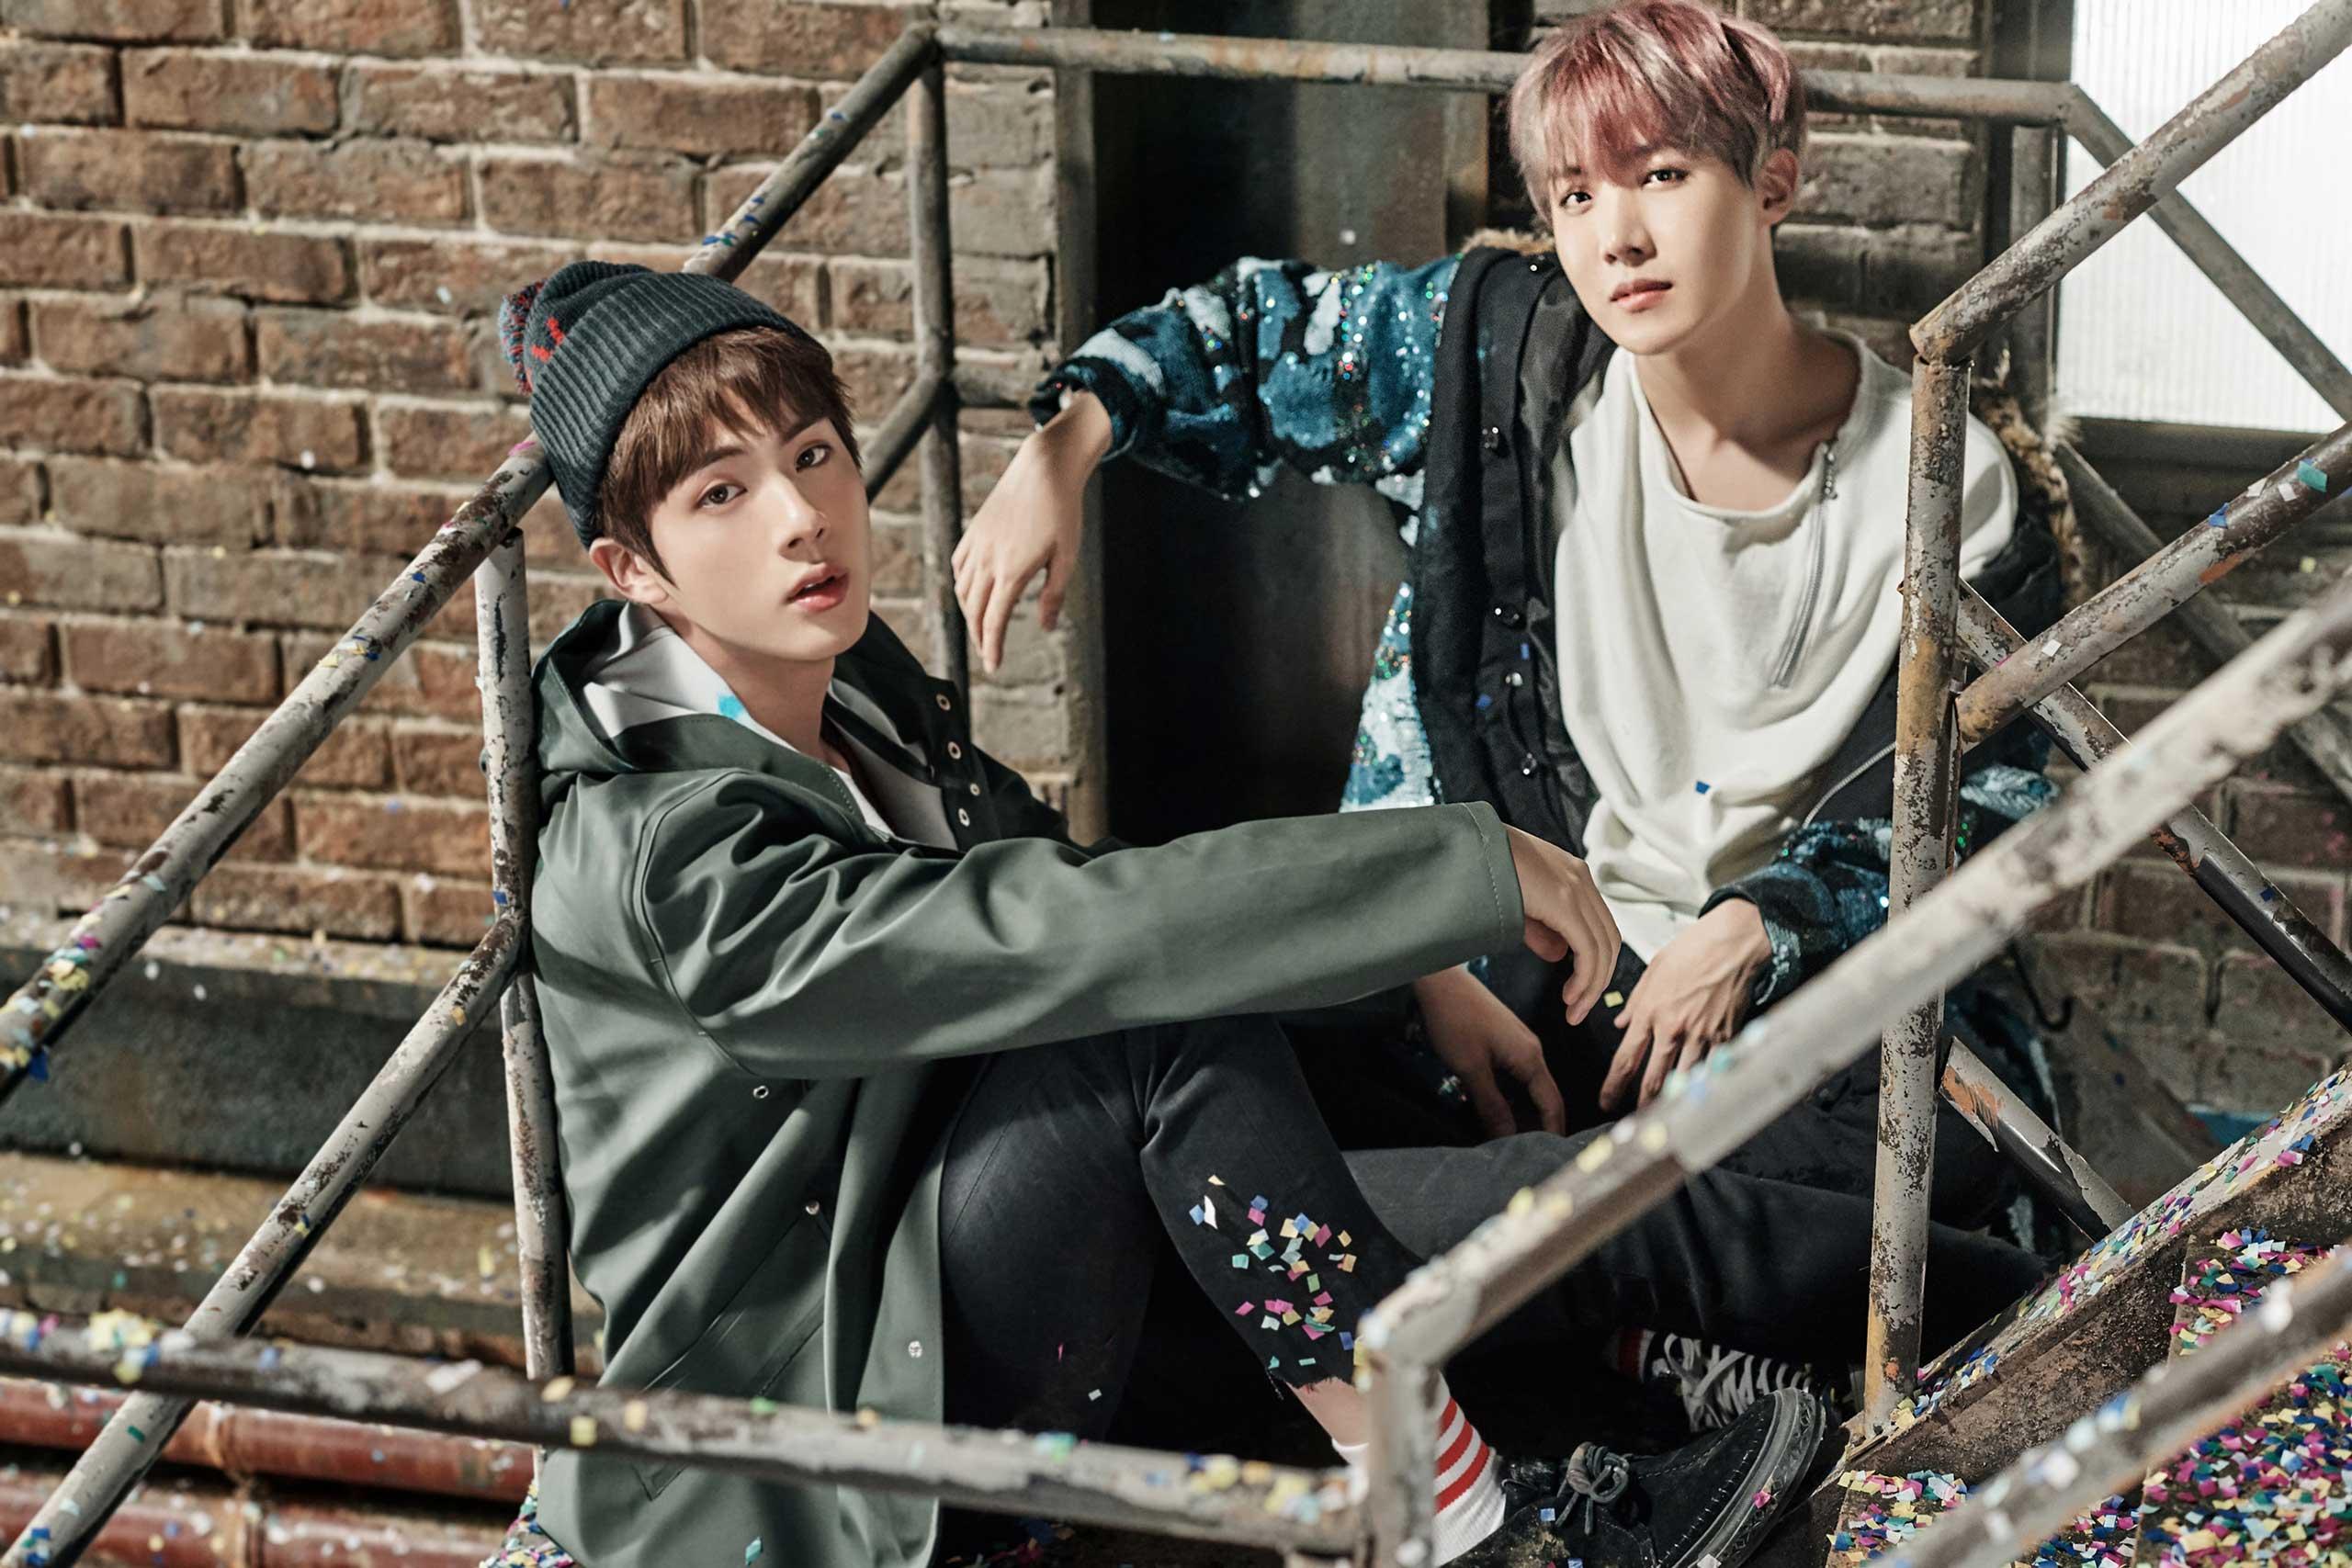 BTS Eras [2013-2017] | BTS Profile